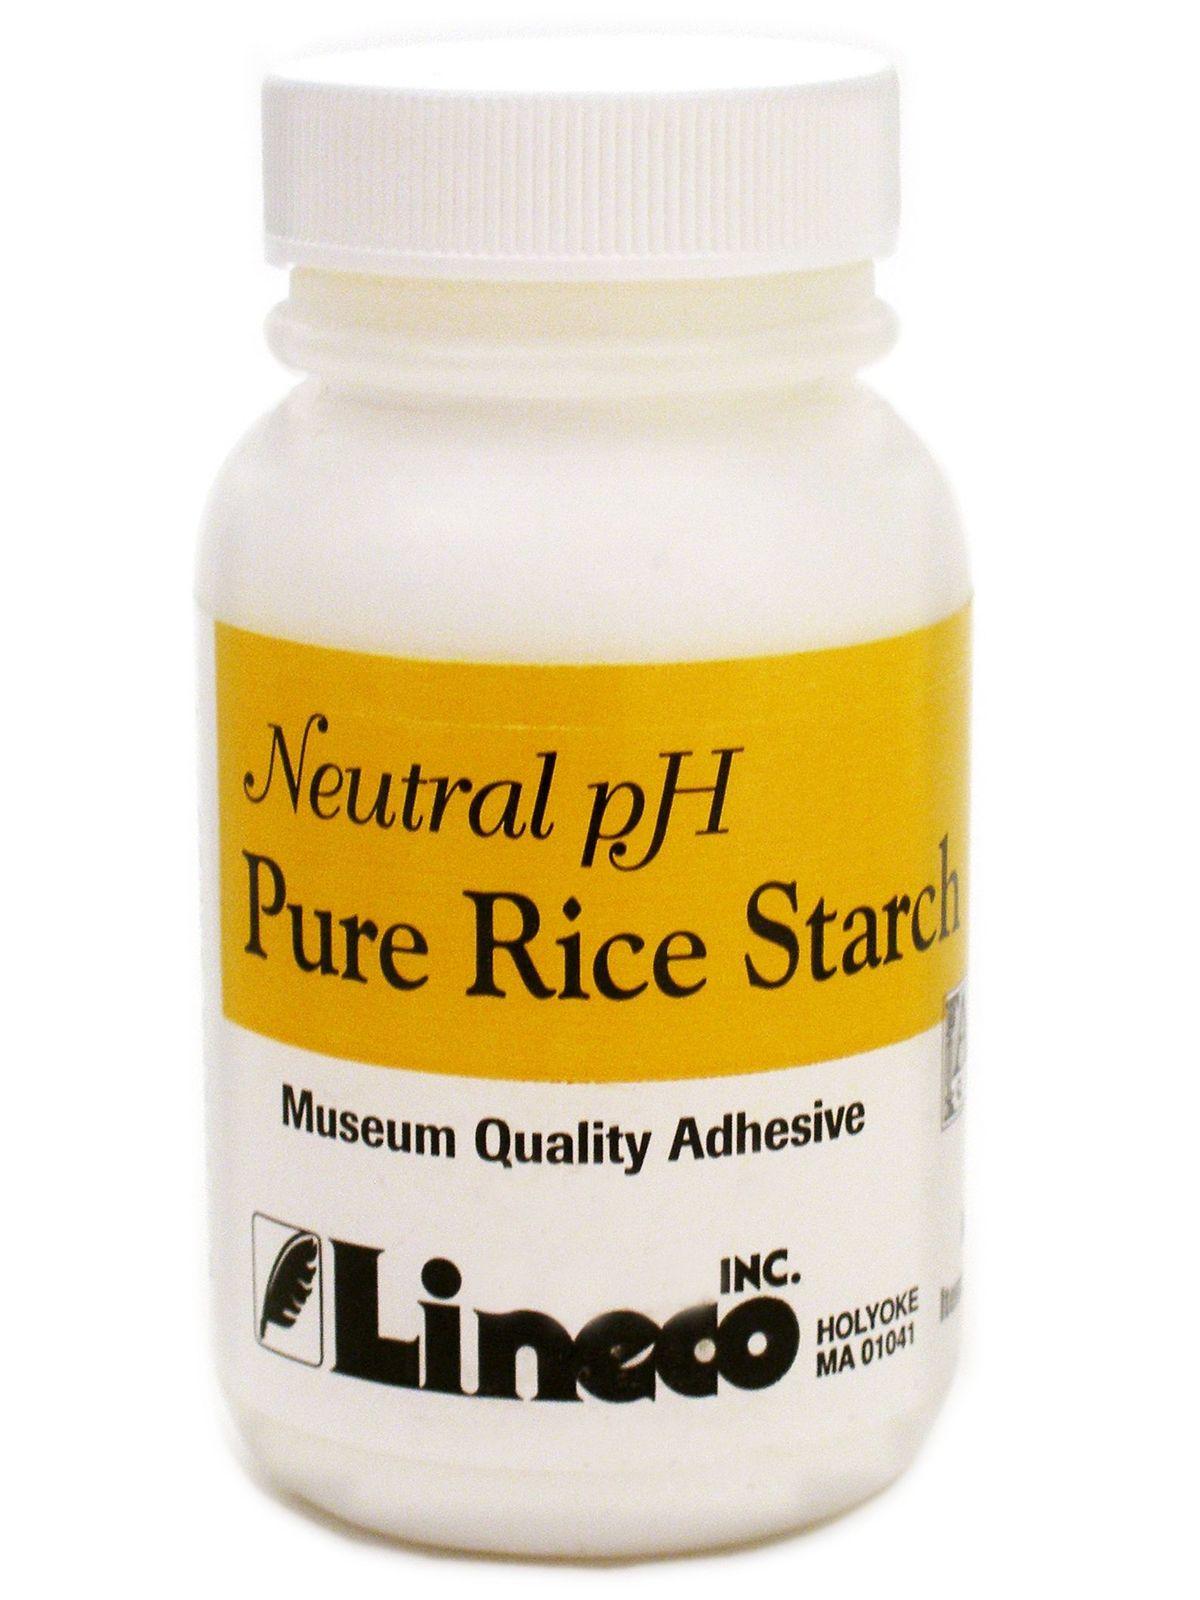 Pure rice